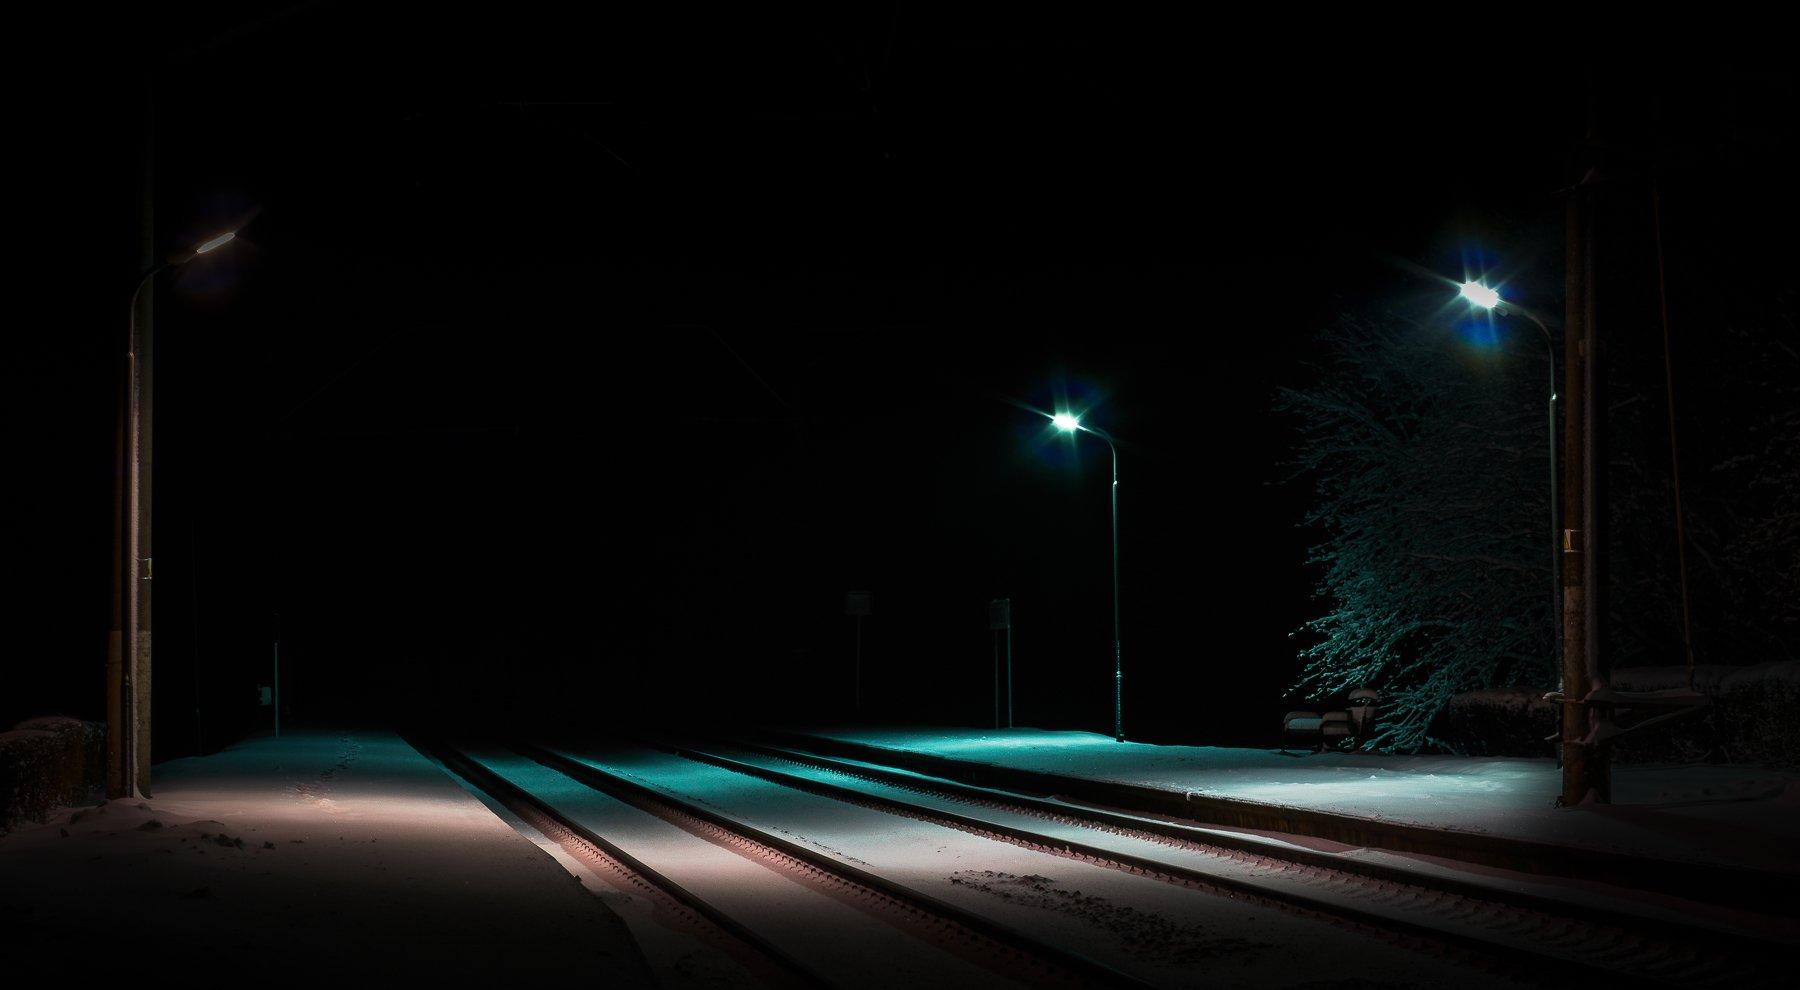 city, citylife, citylights, citynight, cityscape, cityscapes, light, lightning, lights,night, nighttime ,winter ,winterlandscape ,winter_nights, зима, ночь, снег, первый снег, беларусь, Хрол Полина